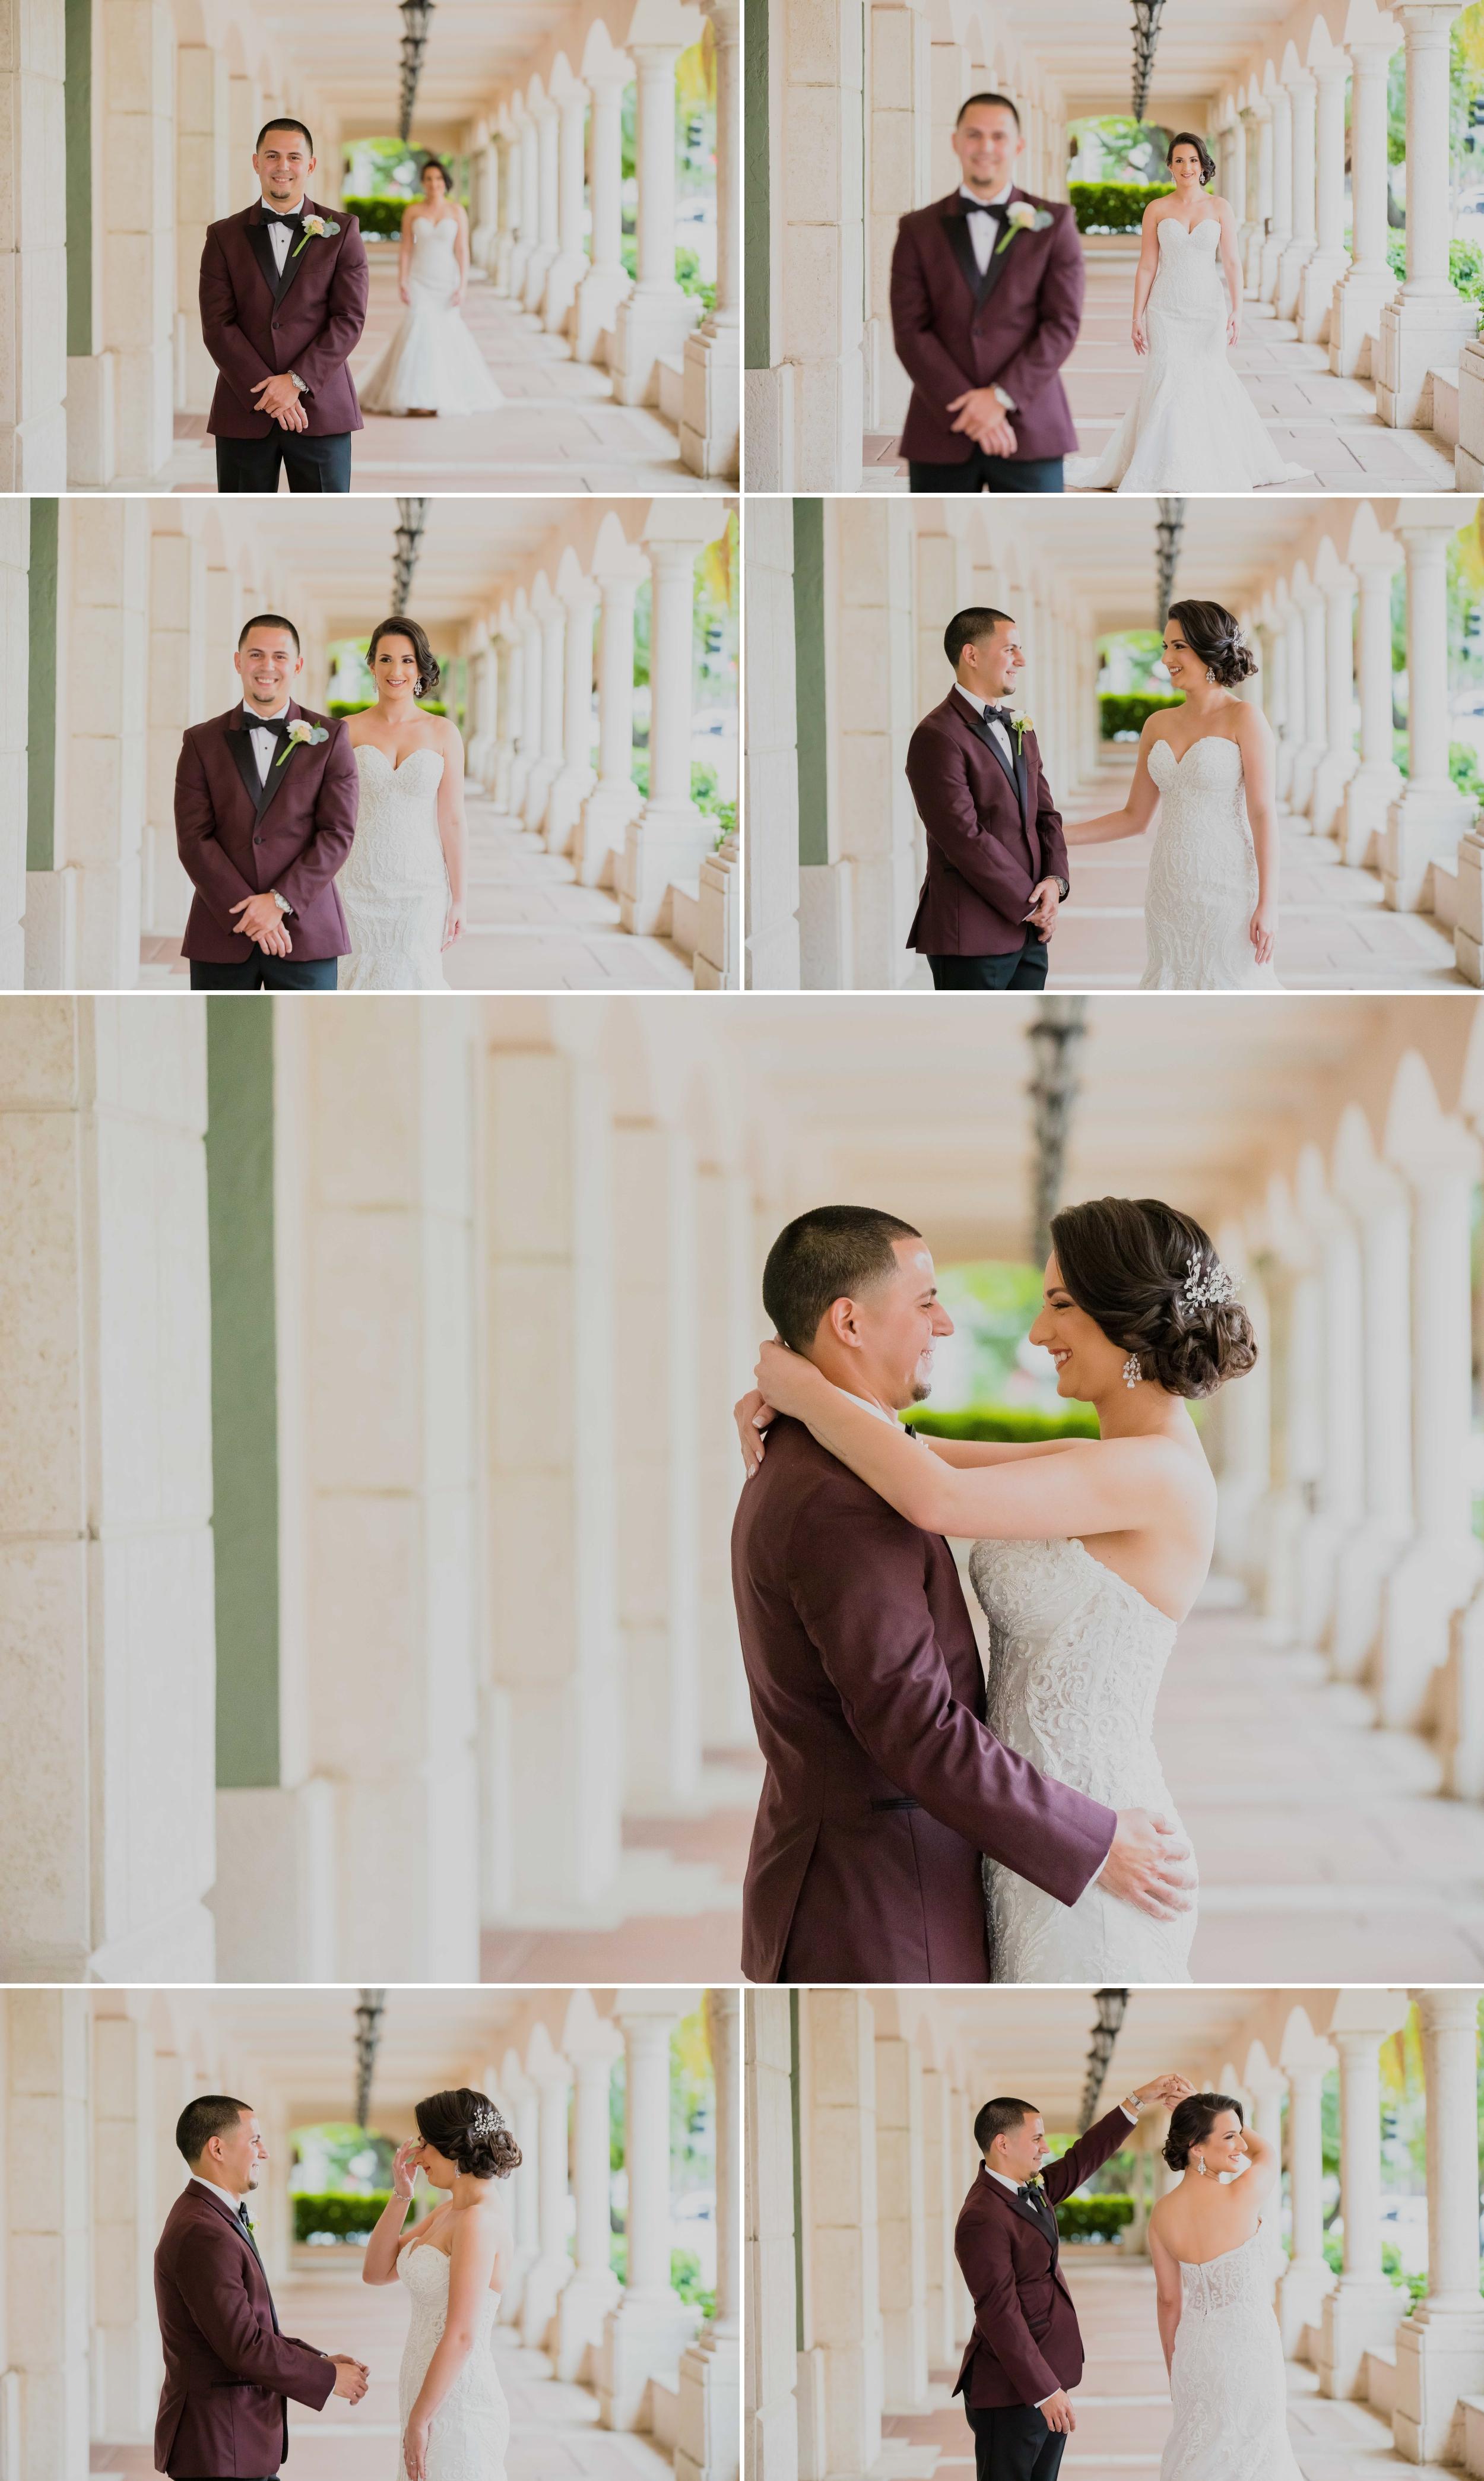 Wedding - Coco Plum - Coral Gables Congregational - Santy Martinez Photography 12.jpg